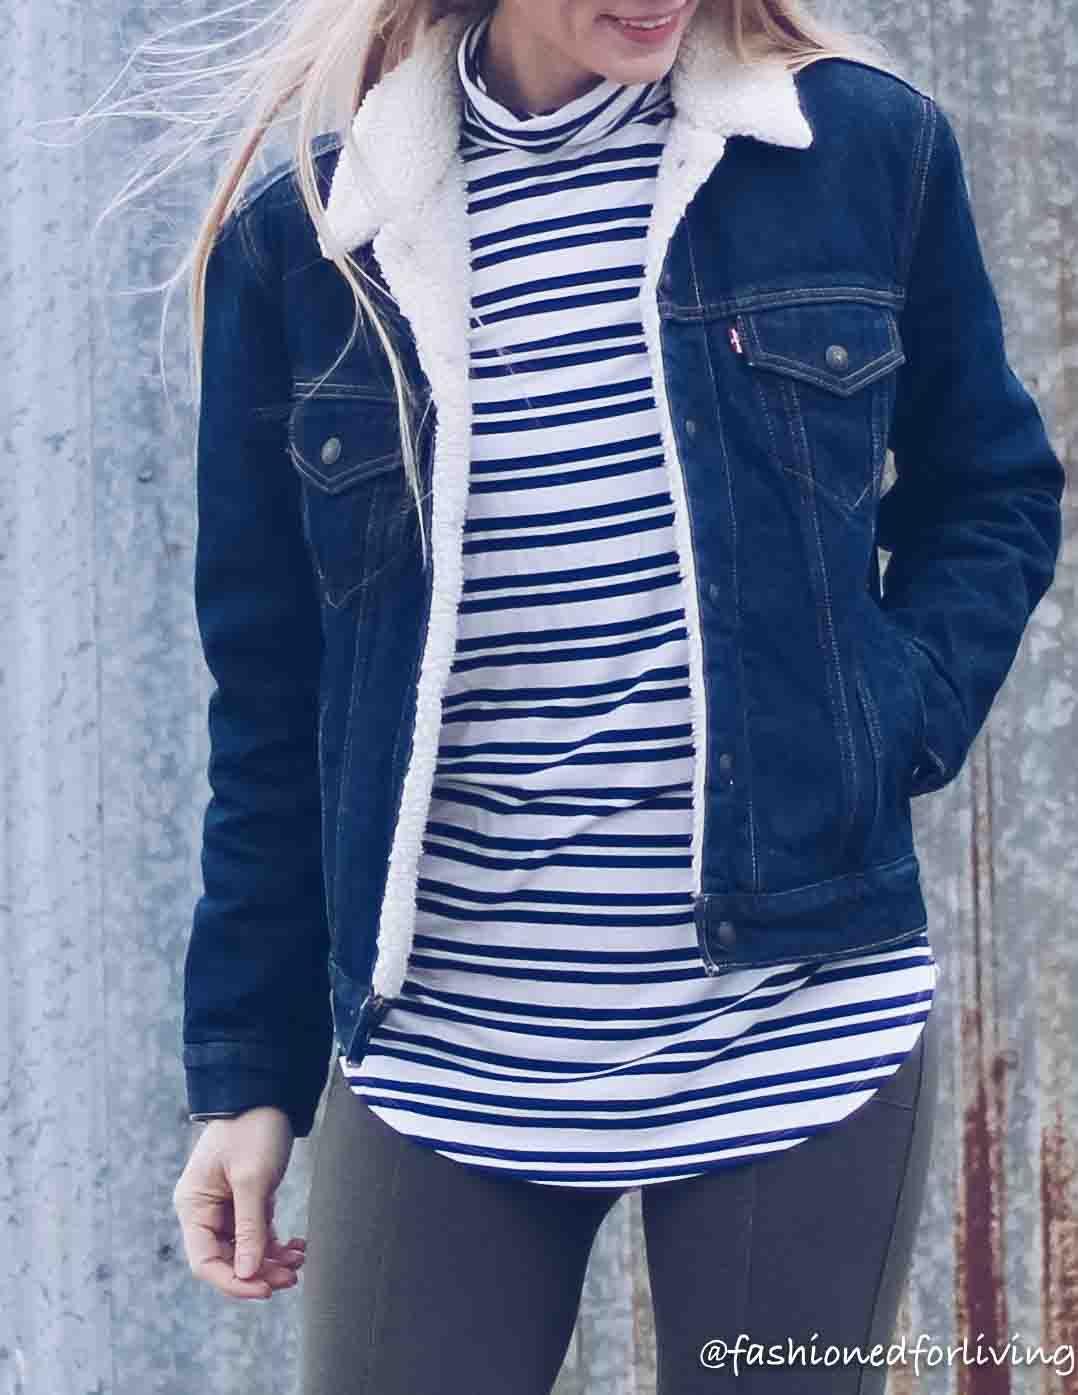 Womens Levis Denim Jacket Winter Fashion Casual Winter Fashion Outfits Outfits With Leggings [ 1395 x 1078 Pixel ]